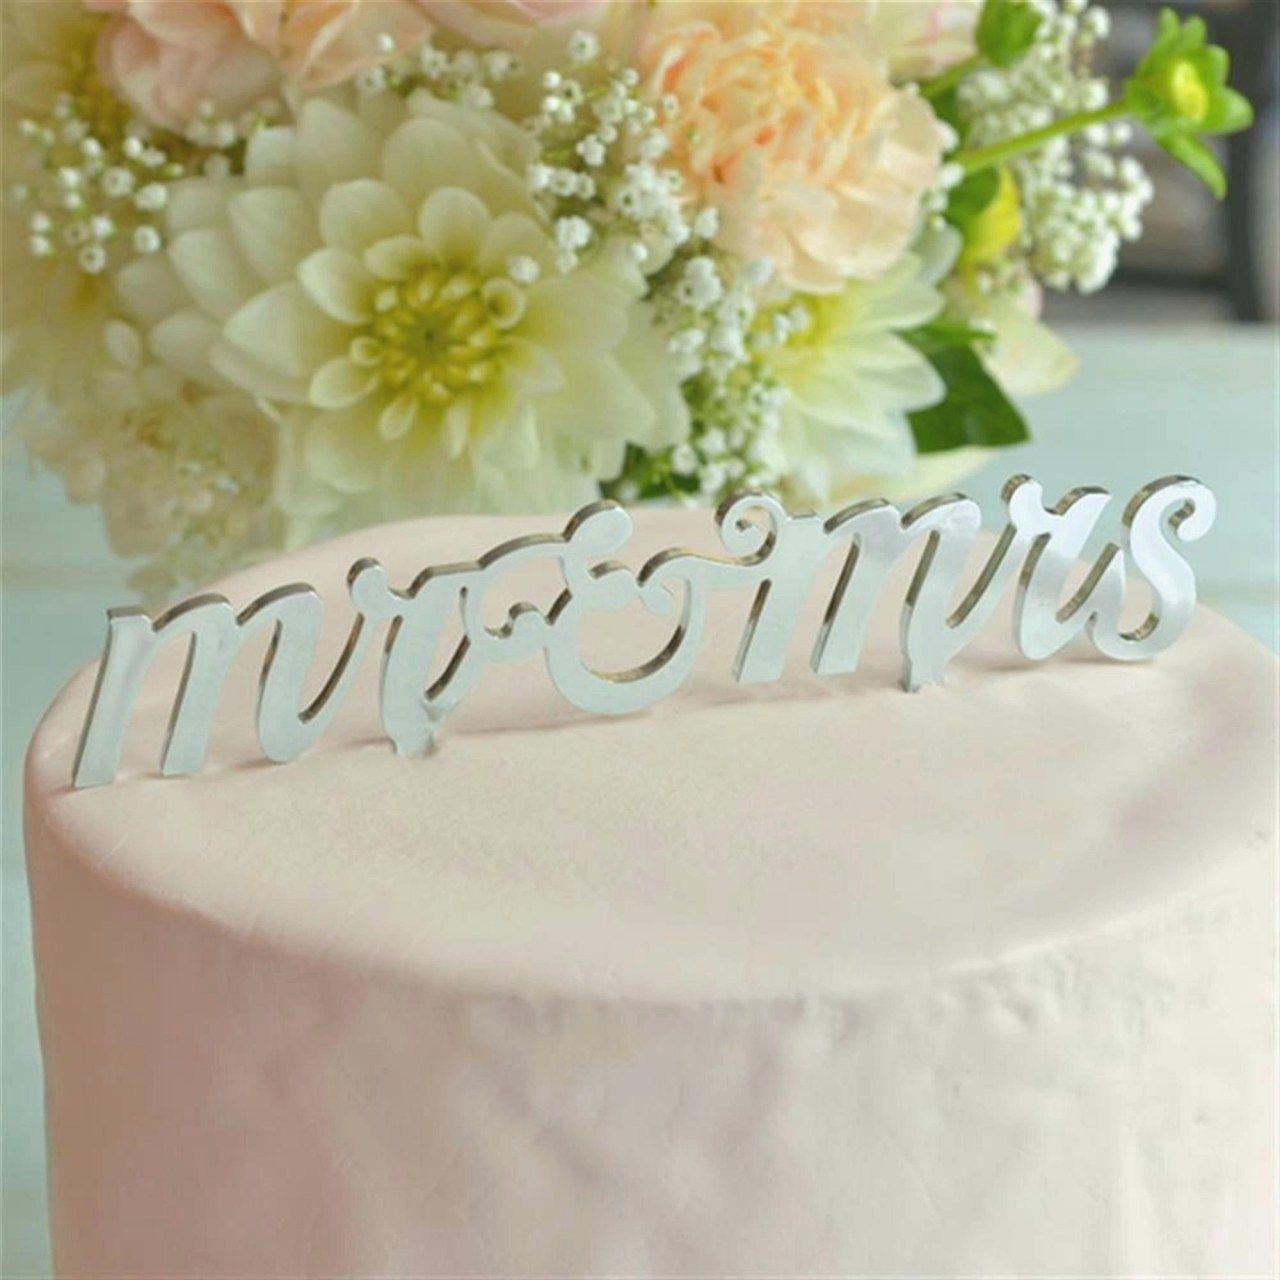 Birthday Cake Toppers Michaels Beautiful Wedding Cake Toppers Michaels Icets Decorazioni Torte Con Panna Decorare Torte Torte